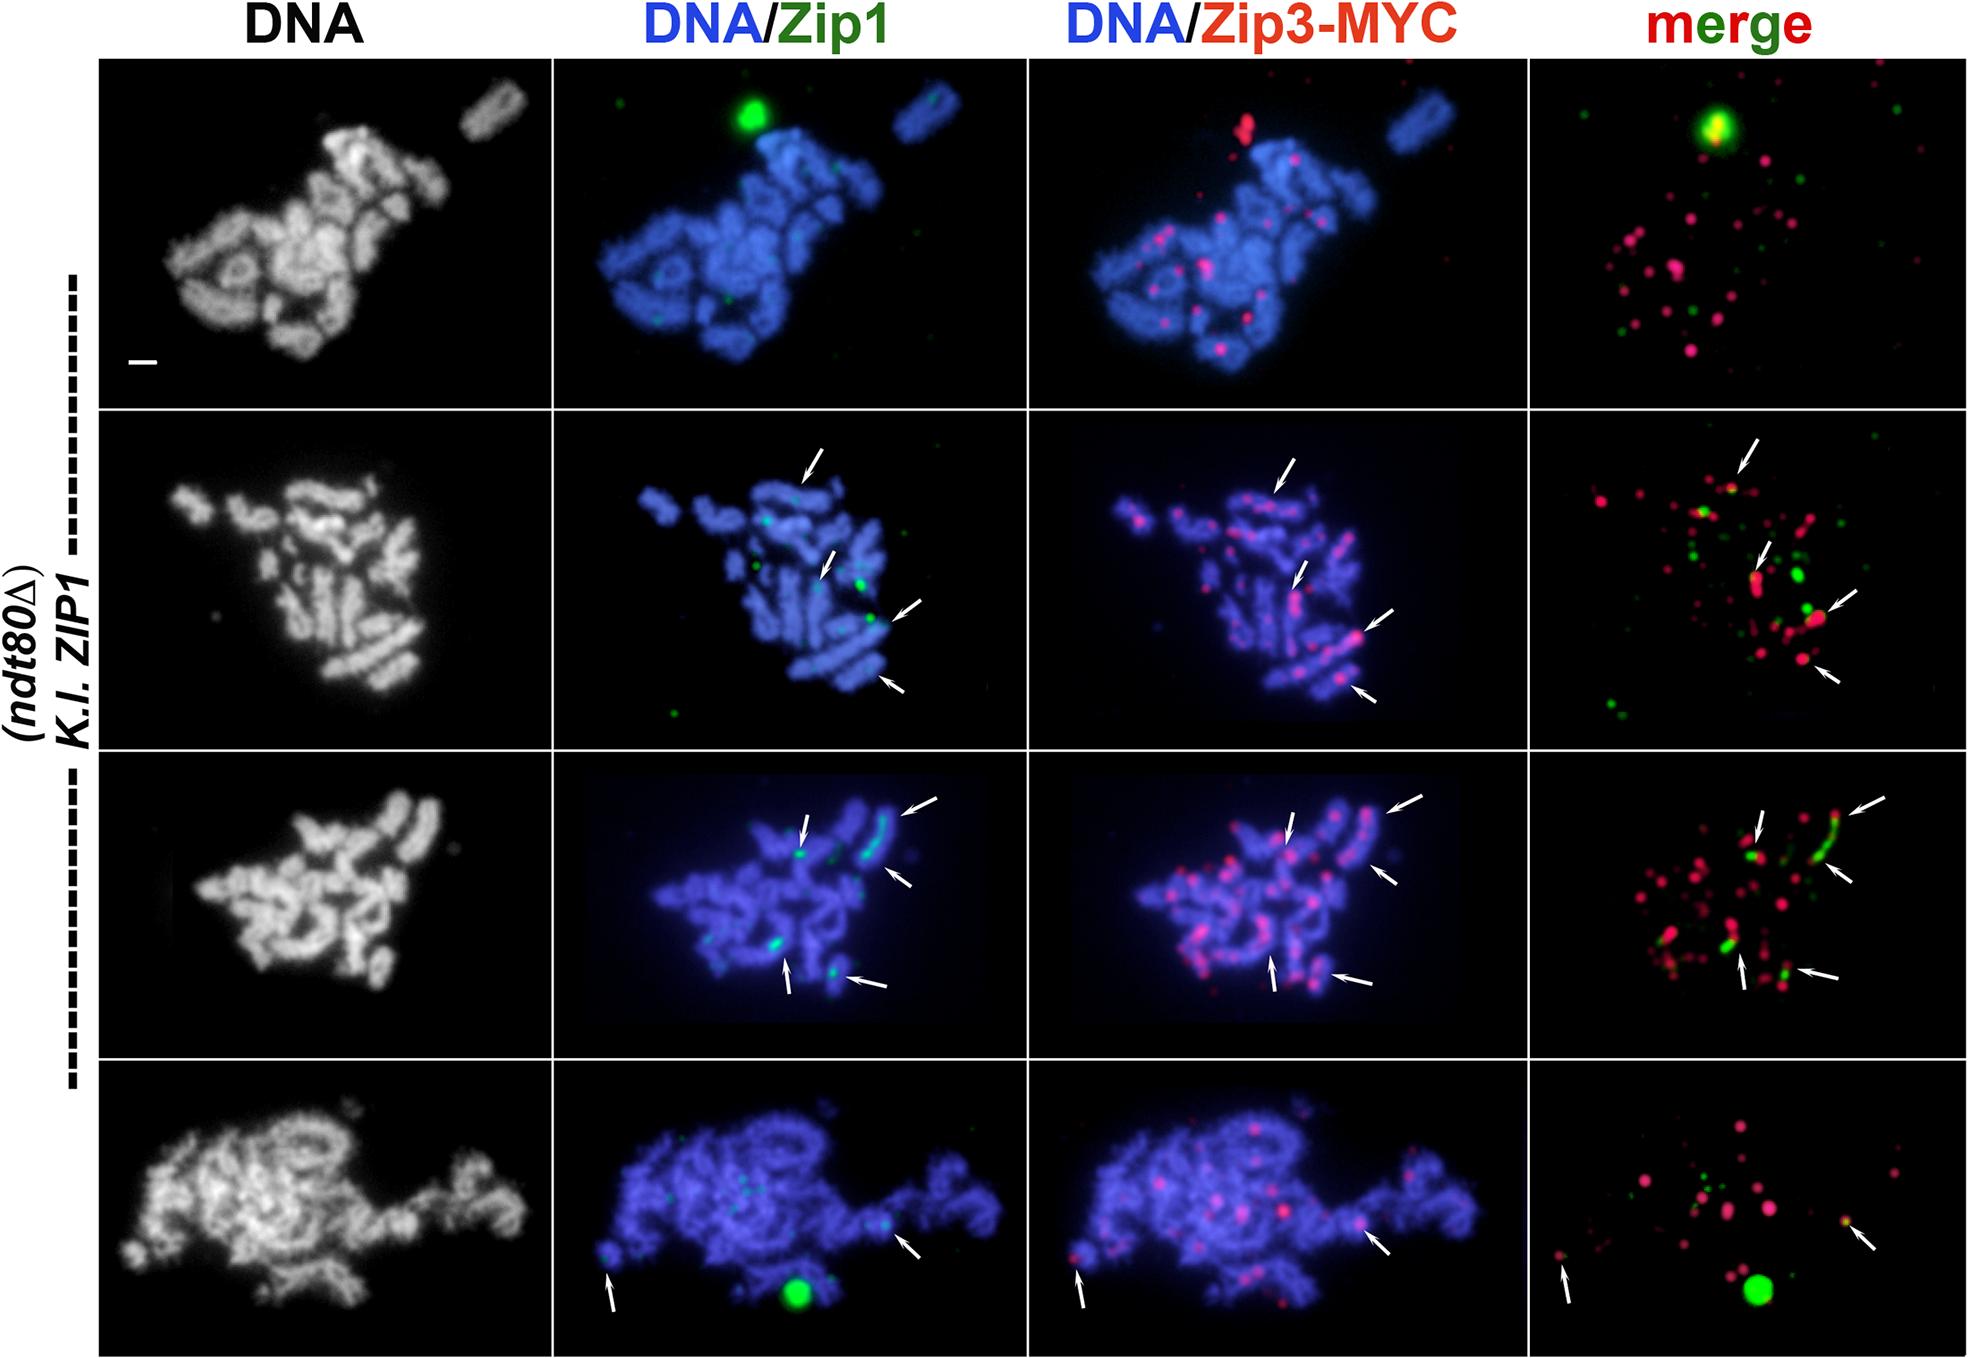 Relative distribution of Zip3-MYC and <i>K</i>. <i>l</i>. Zip1 on meiotic chromosomes in <i>K</i>. <i>l</i>. <i>ZIP1</i>-expressing cells.